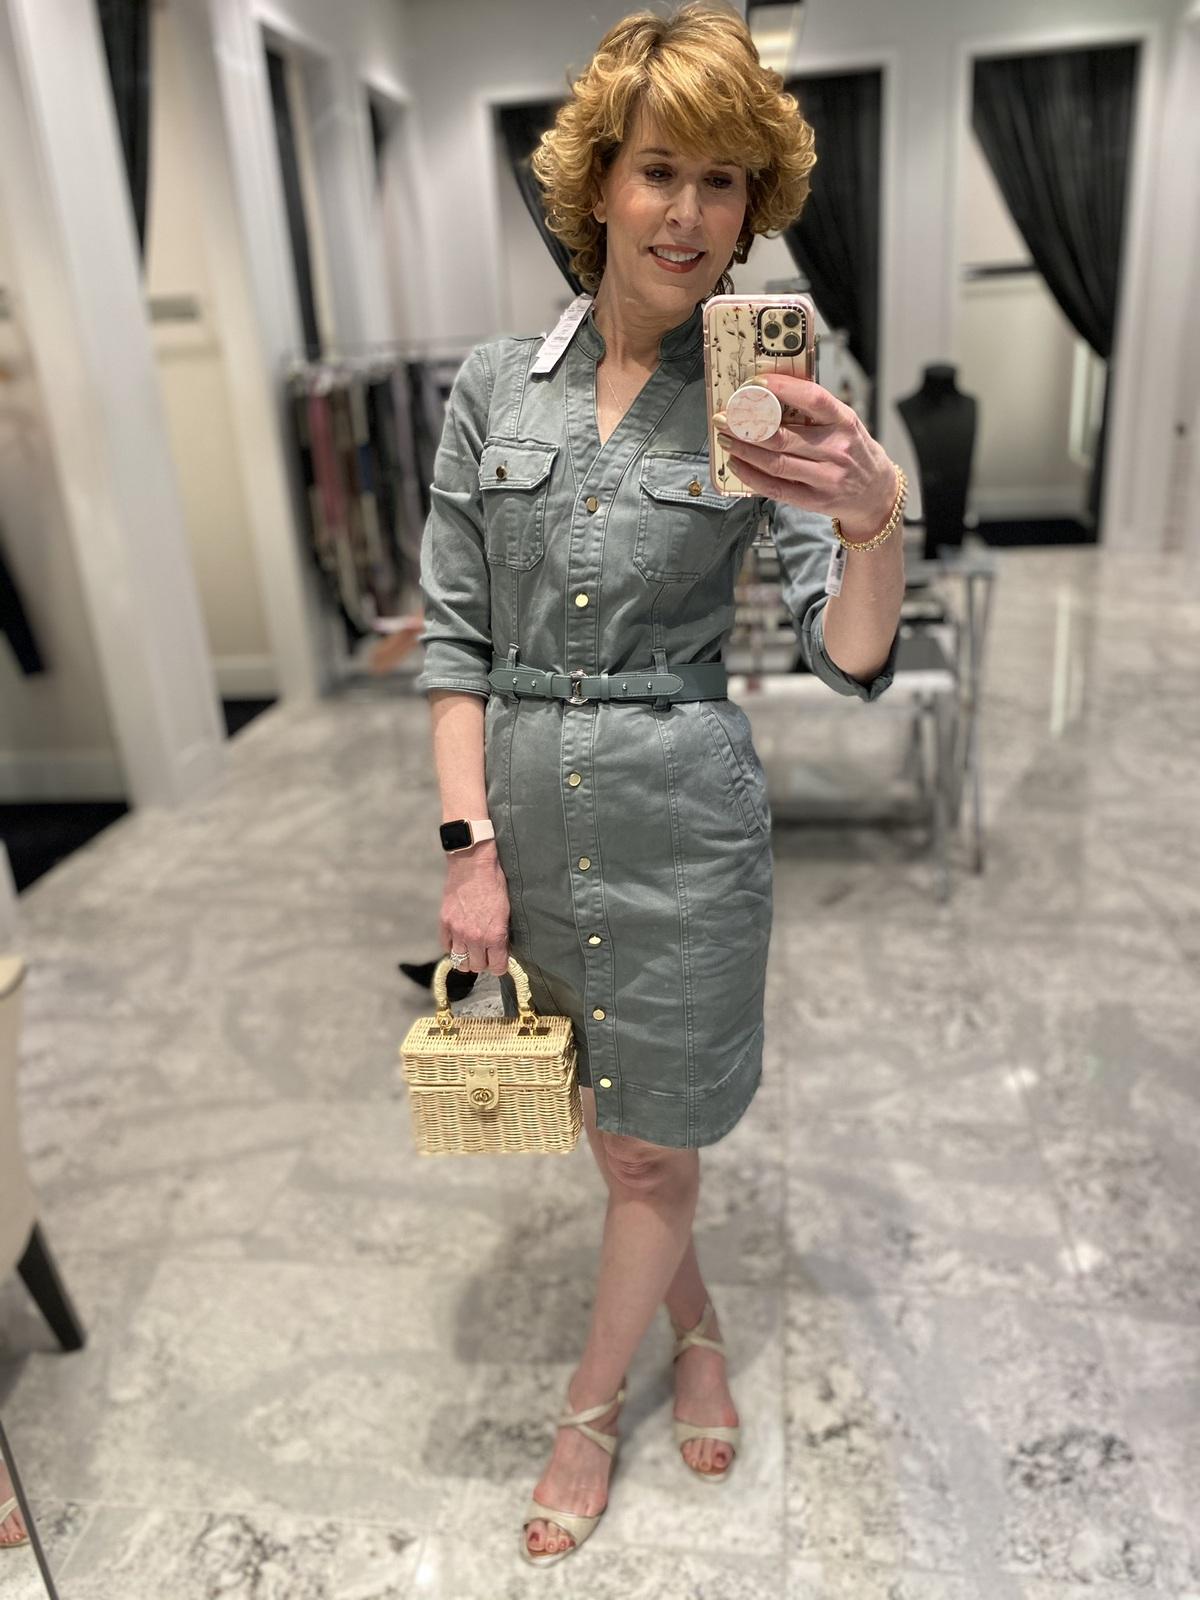 Mirror selfie of woman over 50 wearing green shirtdress green laser cut booties carrying wicker handbag doing spring wardrobe update